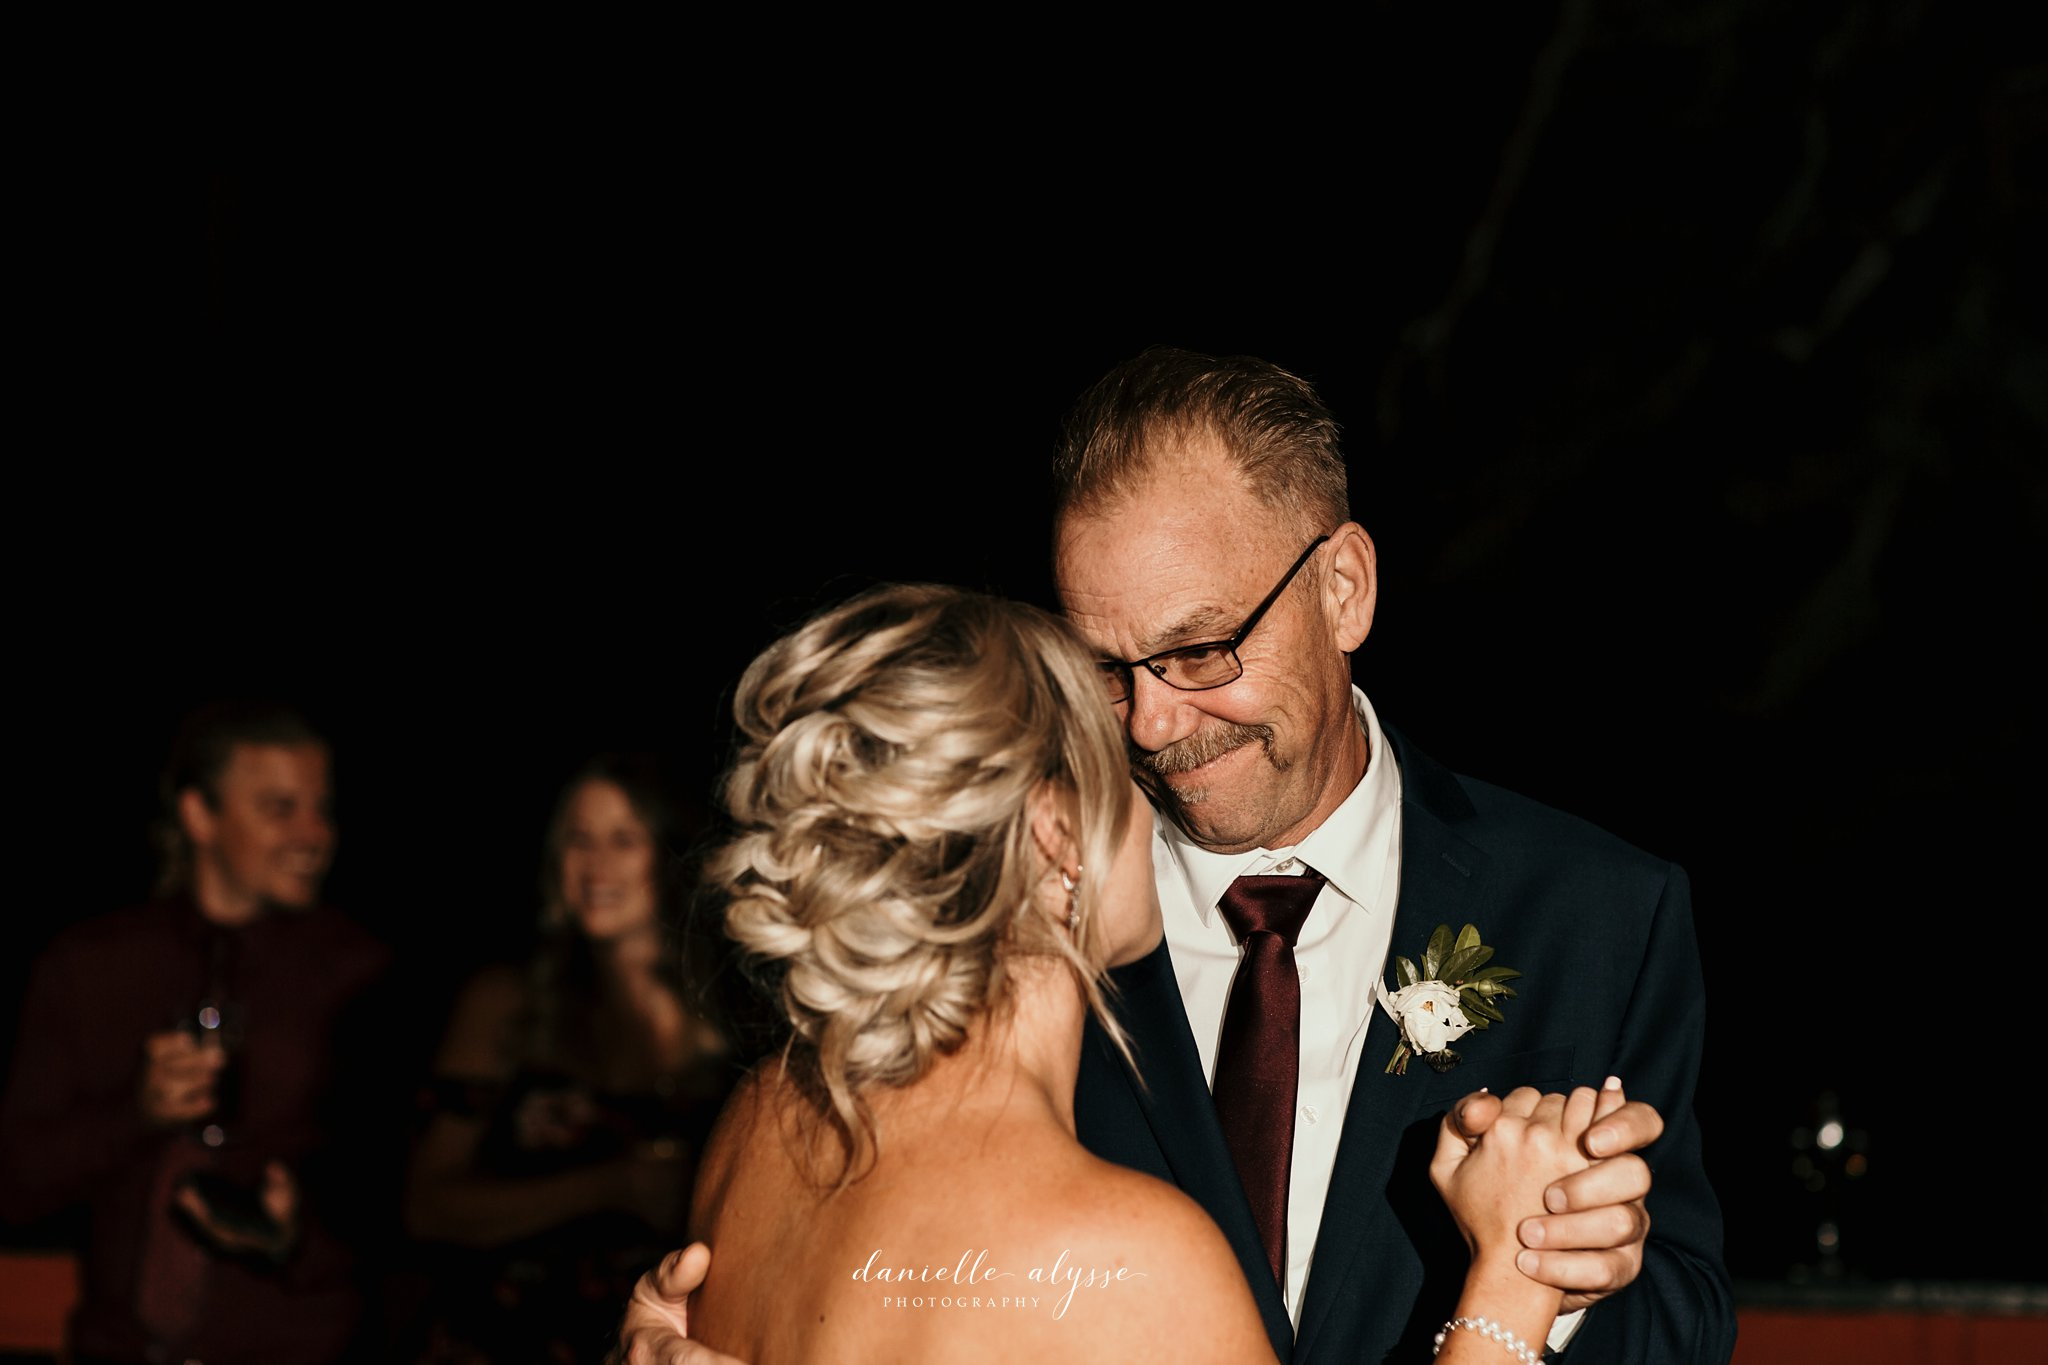 180831_wedding_stephanie_heavenly_south_lake_tahoe_danielle_alysse_photography_destination_blog_1187_WEB.jpg